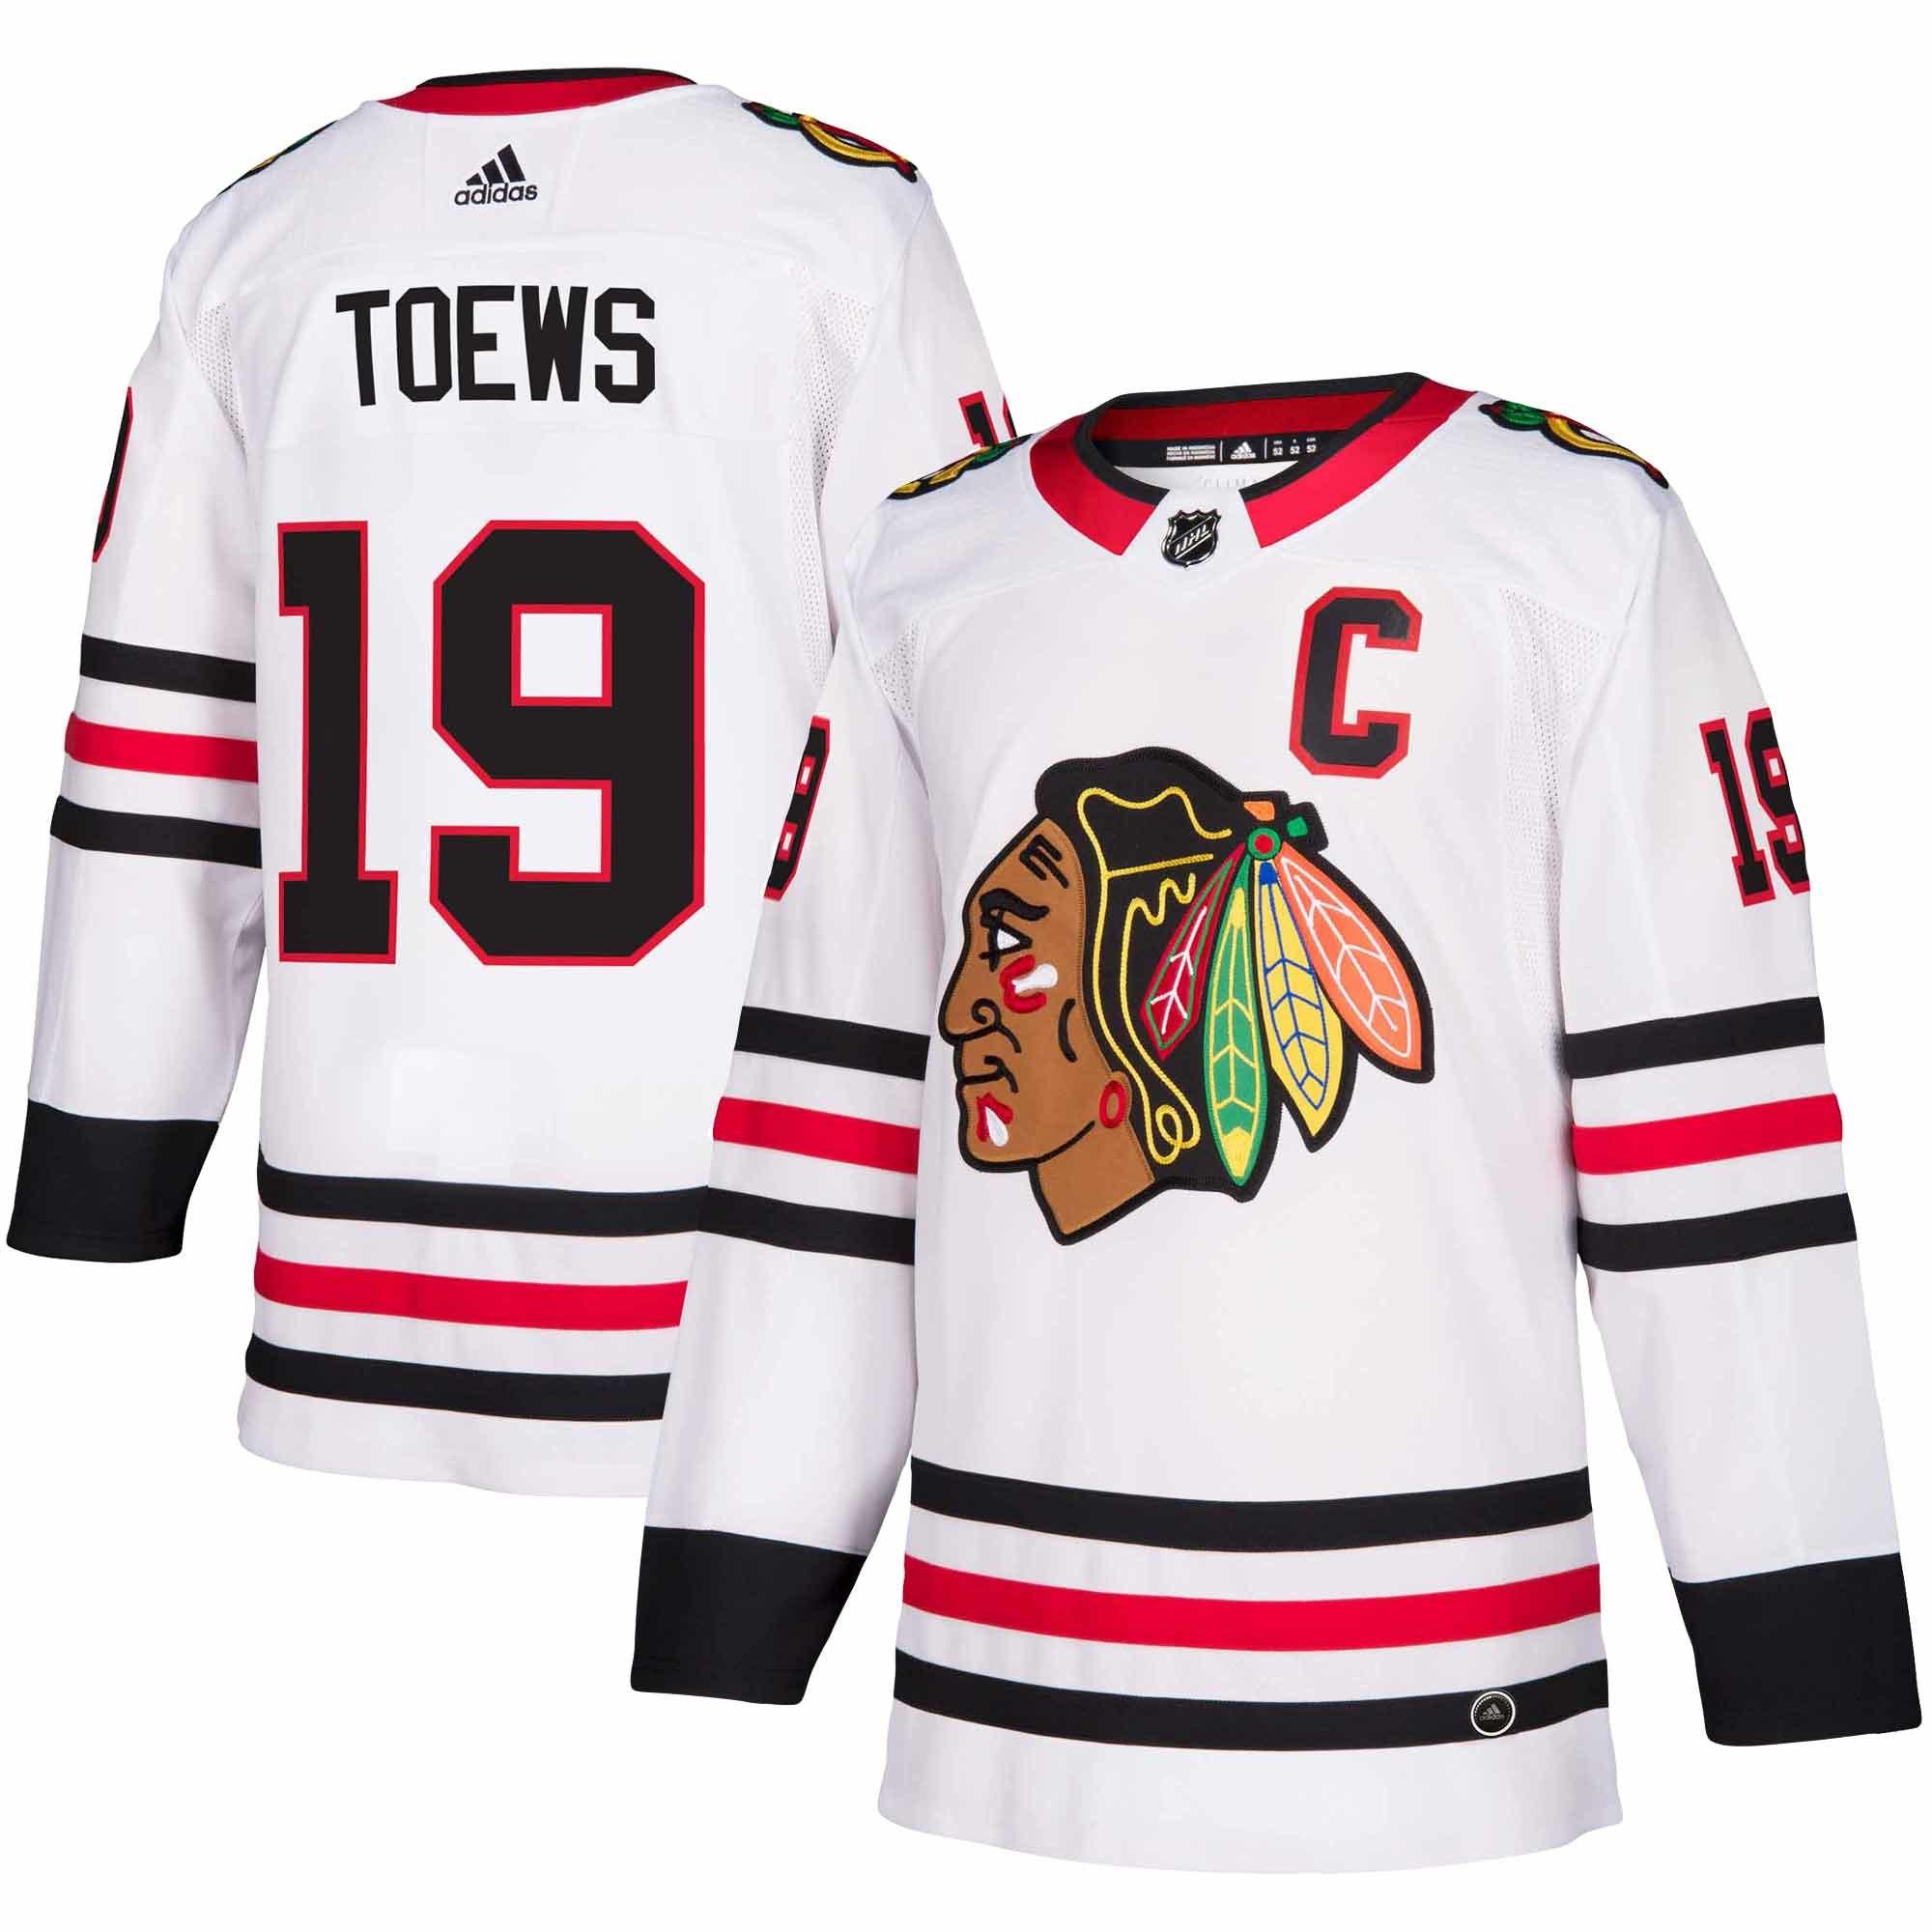 Adidas Dres Chicago Blackhawks #19 Jonathan Toews adizero Away Authentic Player Pro Velikost: L, Distribuce: USA